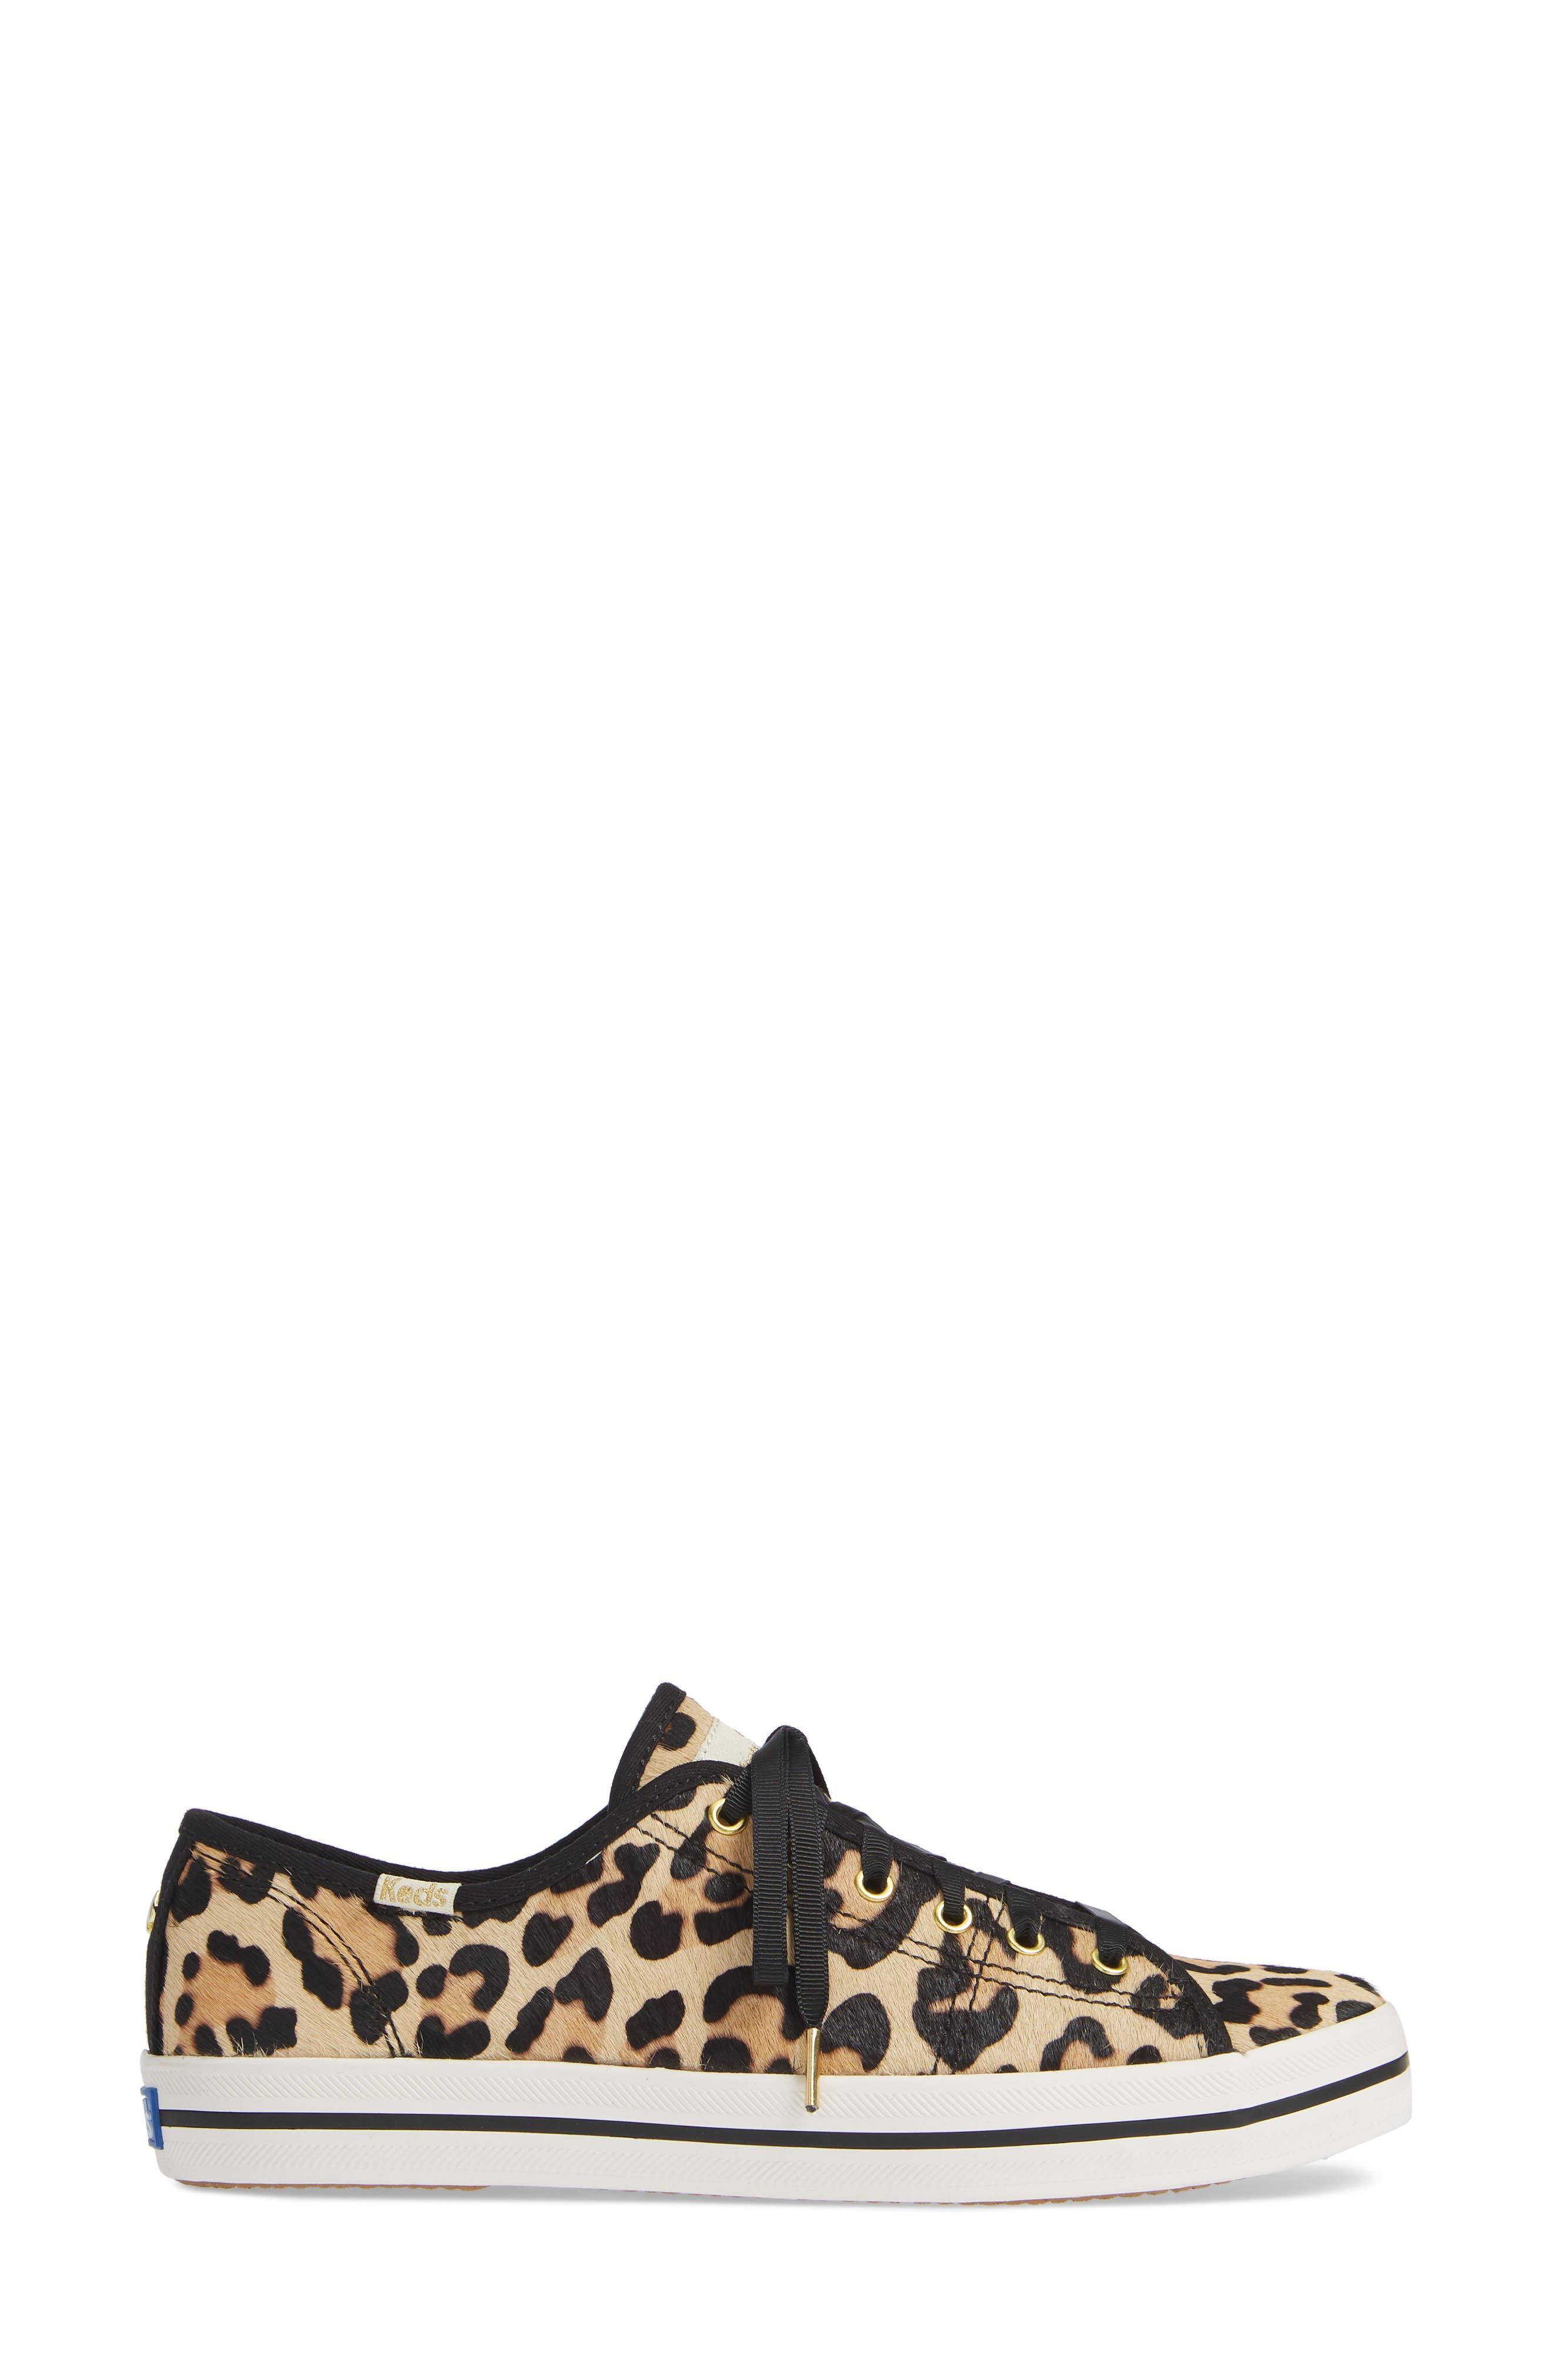 KEDS<SUP>®</SUP> FOR KATE SPADE NEW YORK, kickstart genuine calf hair sneaker, Alternate thumbnail 3, color, TAN LEOPARD CALF HAIR